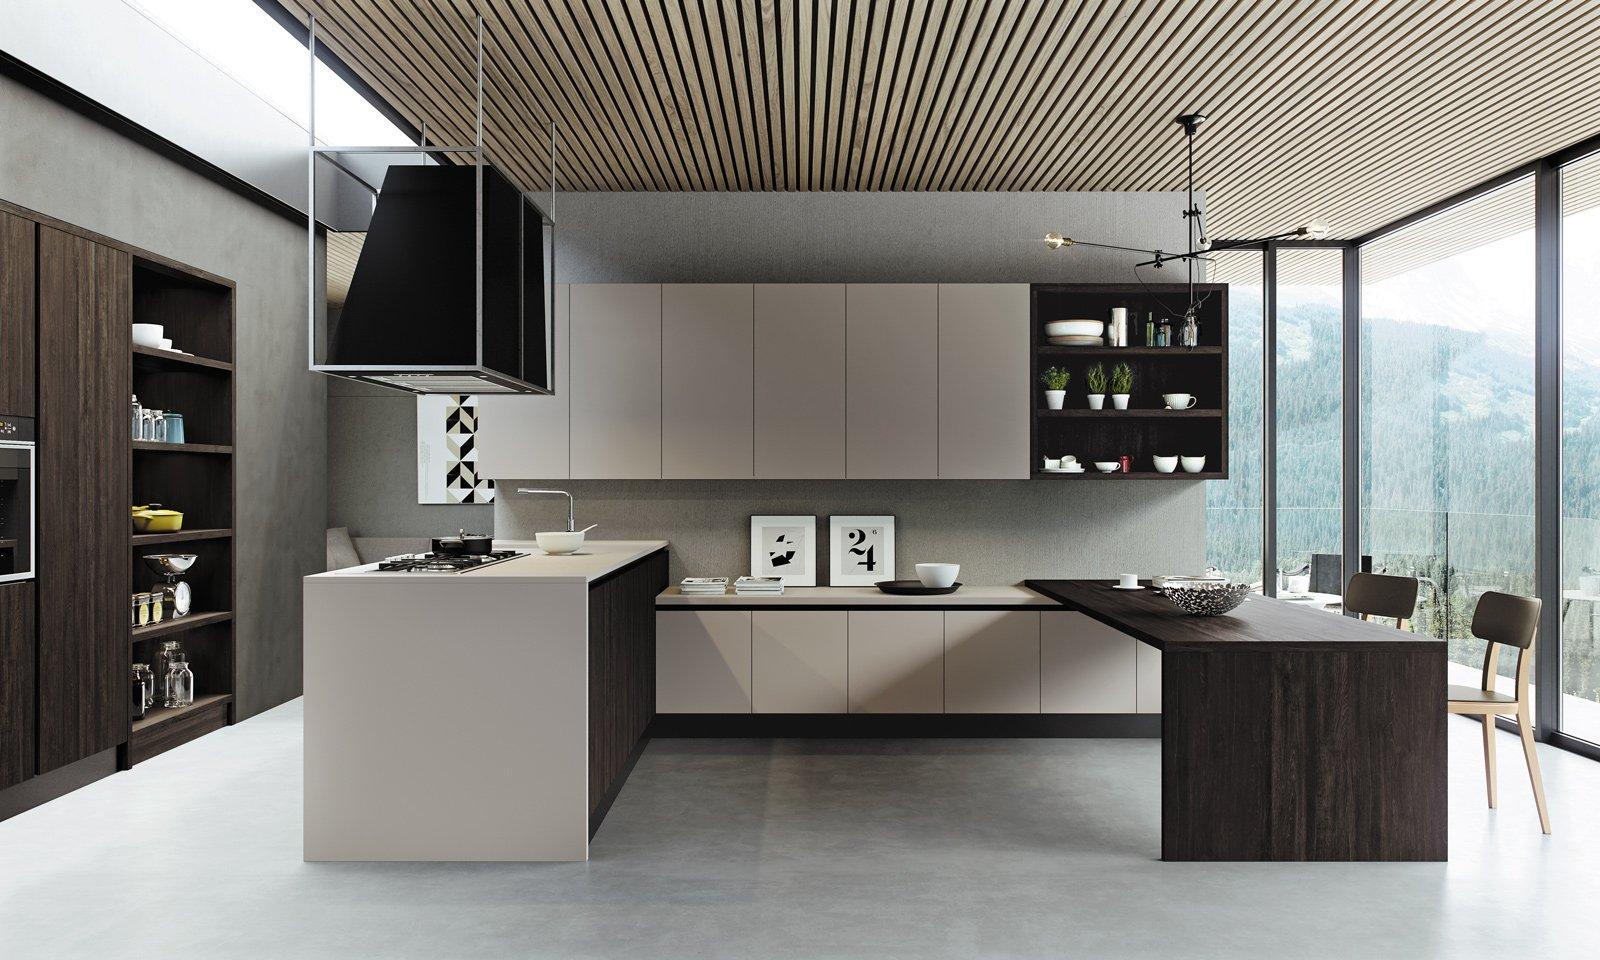 Cucina contenere di pi con tanti pensili o pensili grandi cose di casa - Maniglie per pensili cucina ...